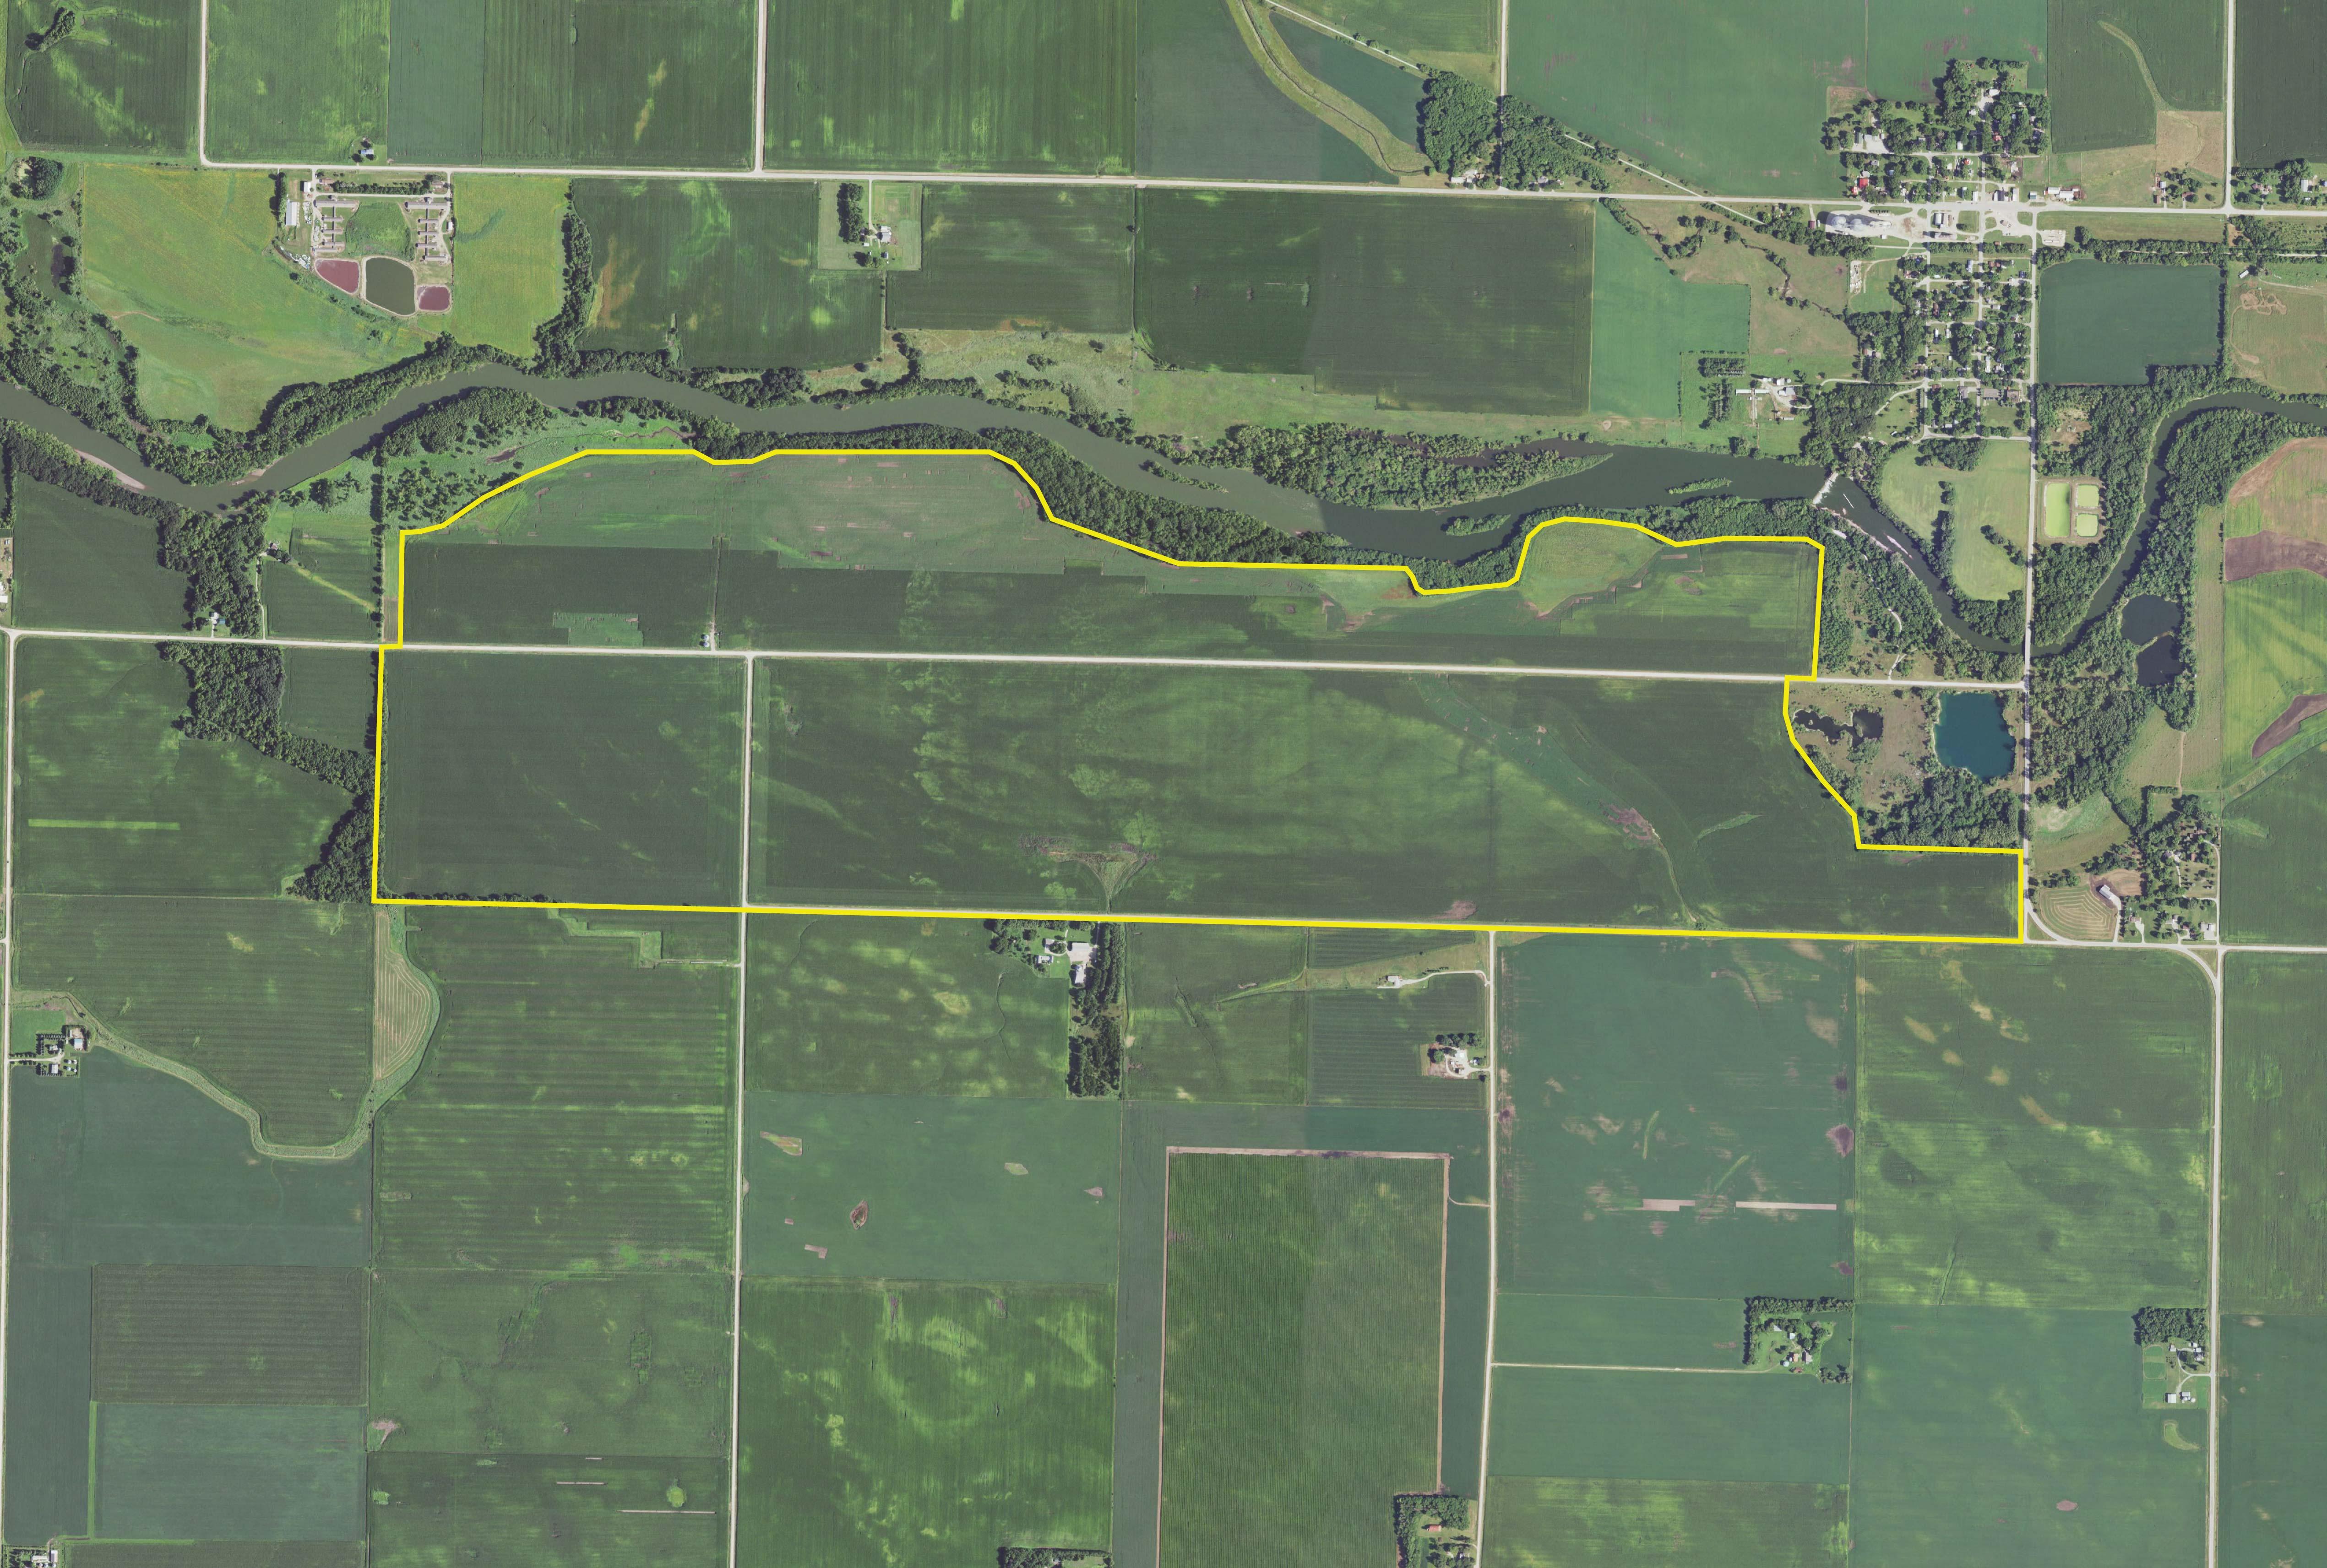 New ListingHumboldt County, IA - 699± Acres